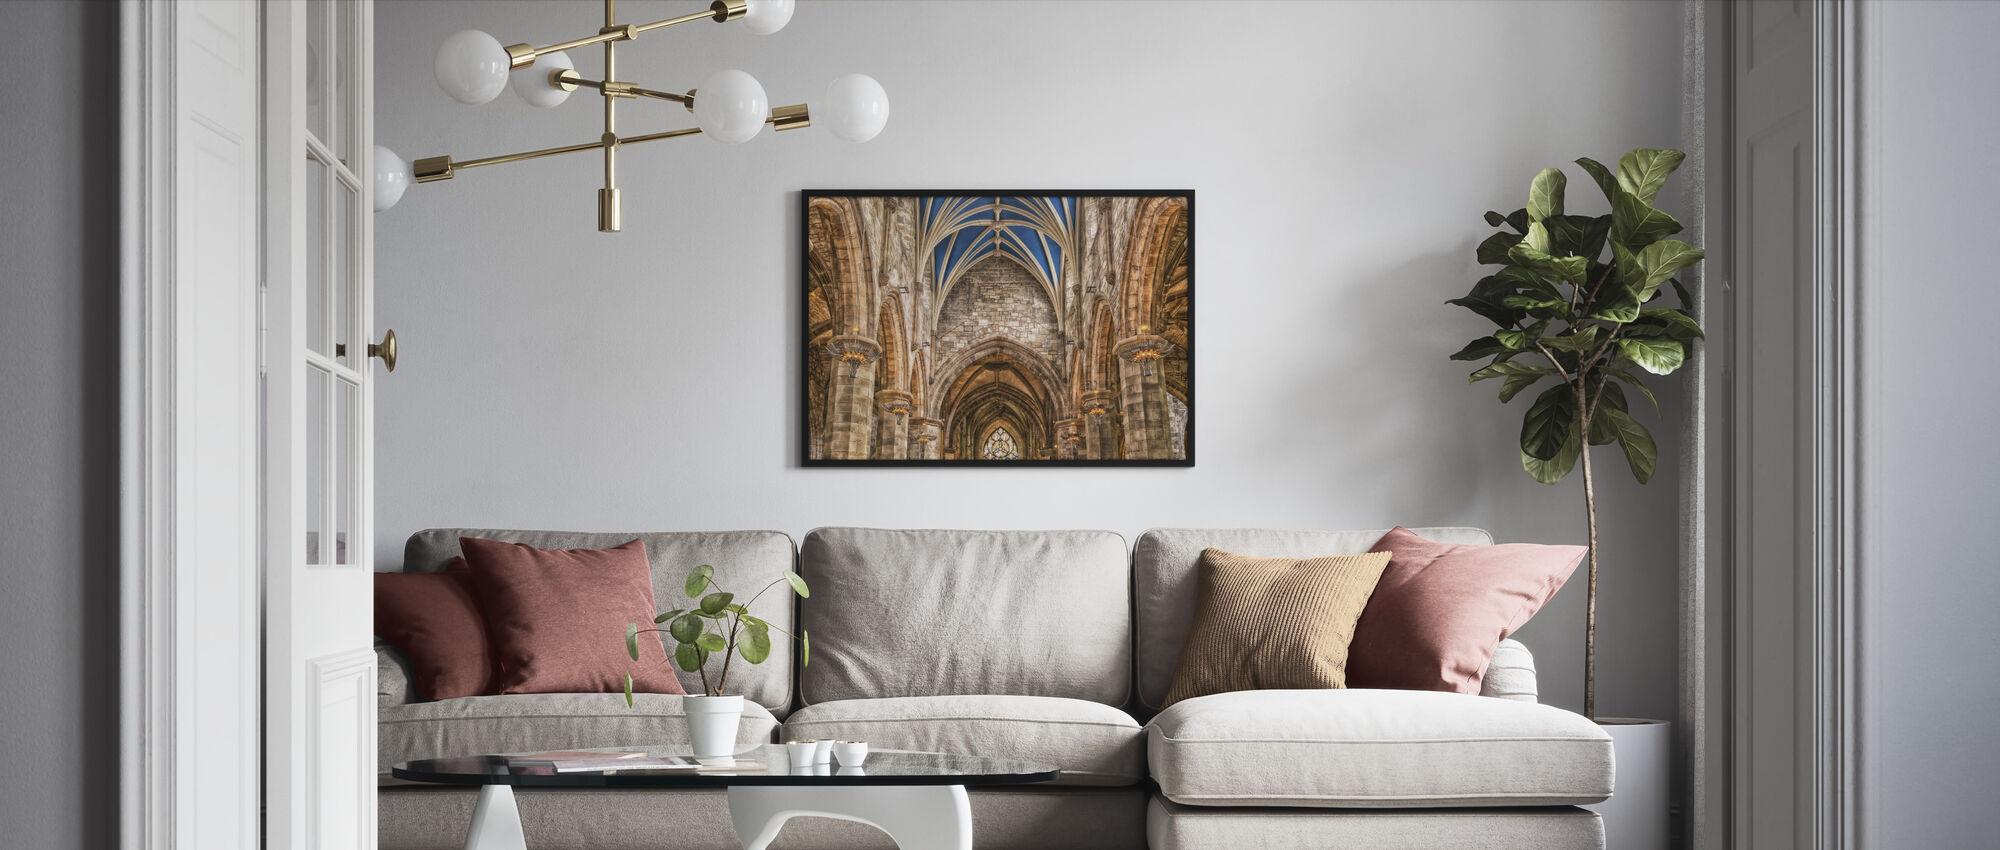 Cathedral Pillars - Framed print - Living Room